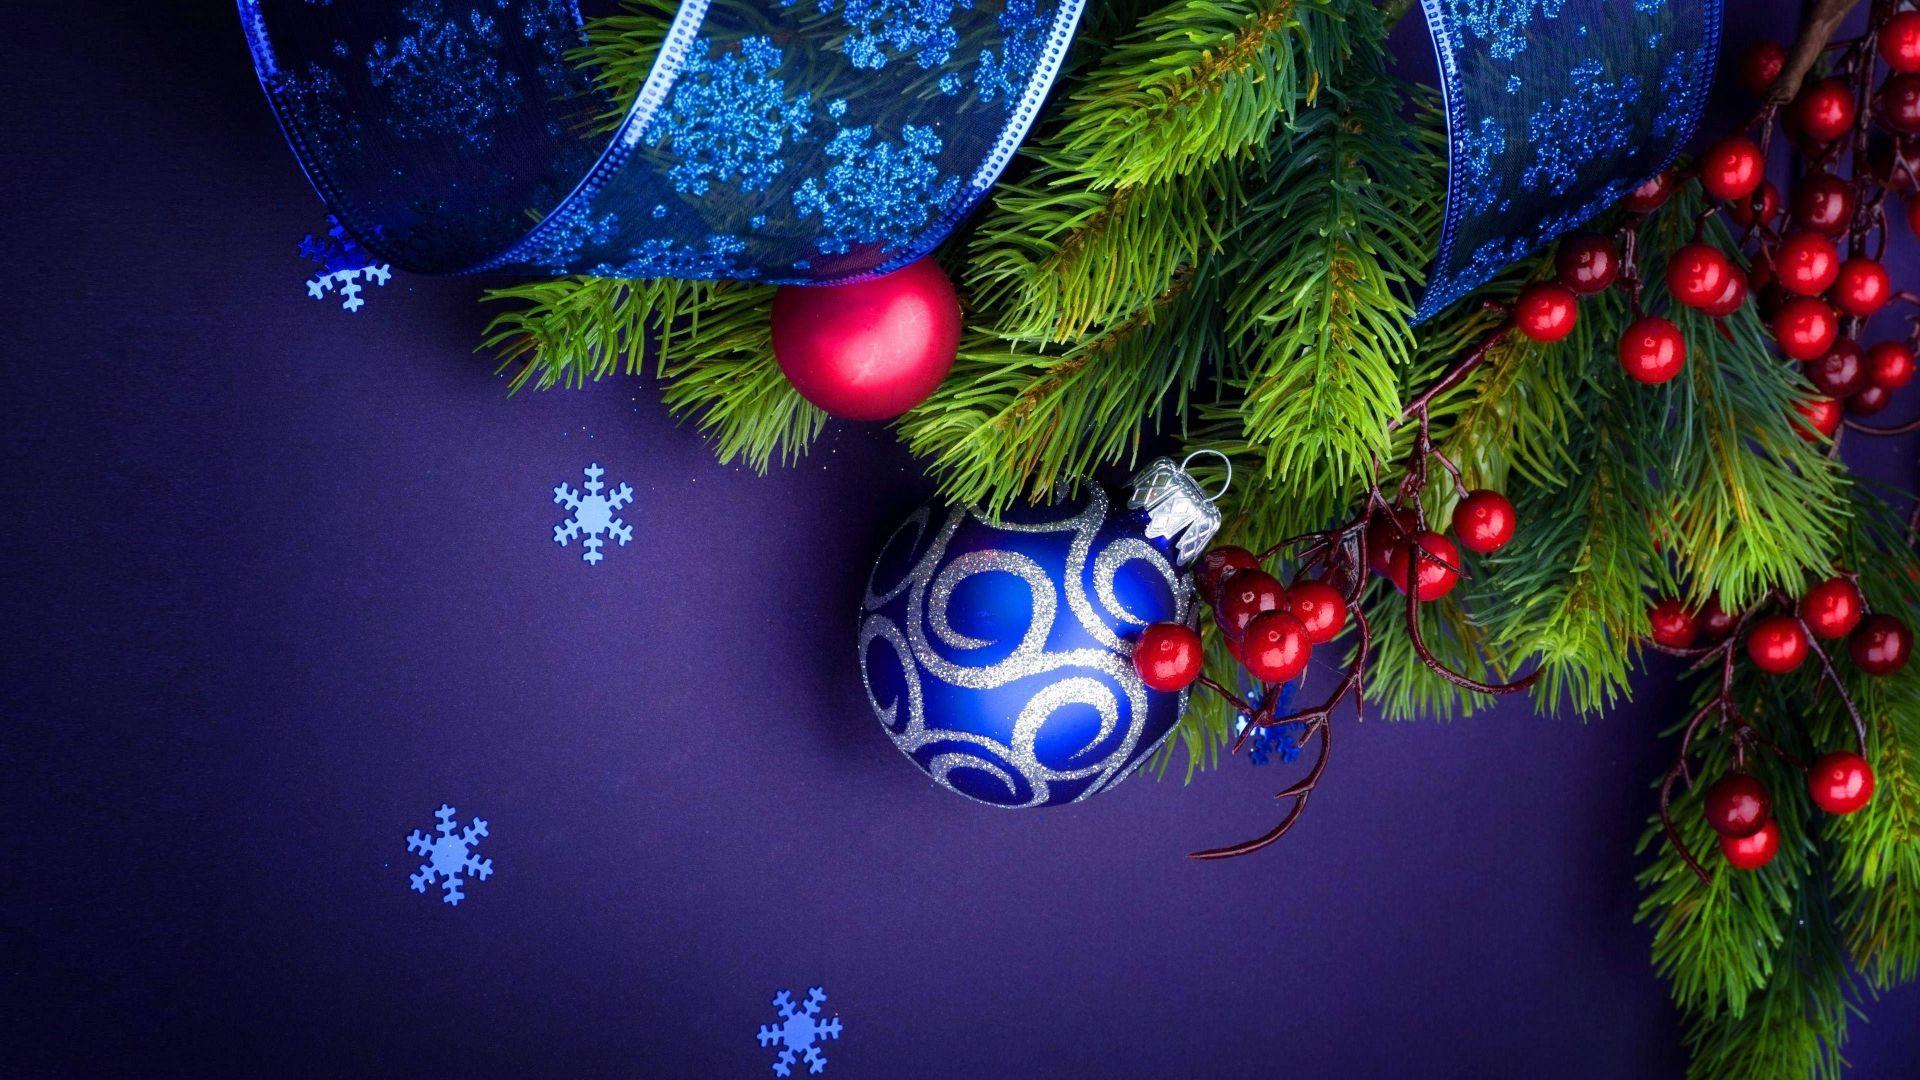 Wallpaper Christmas ornaments, Xmas decorations